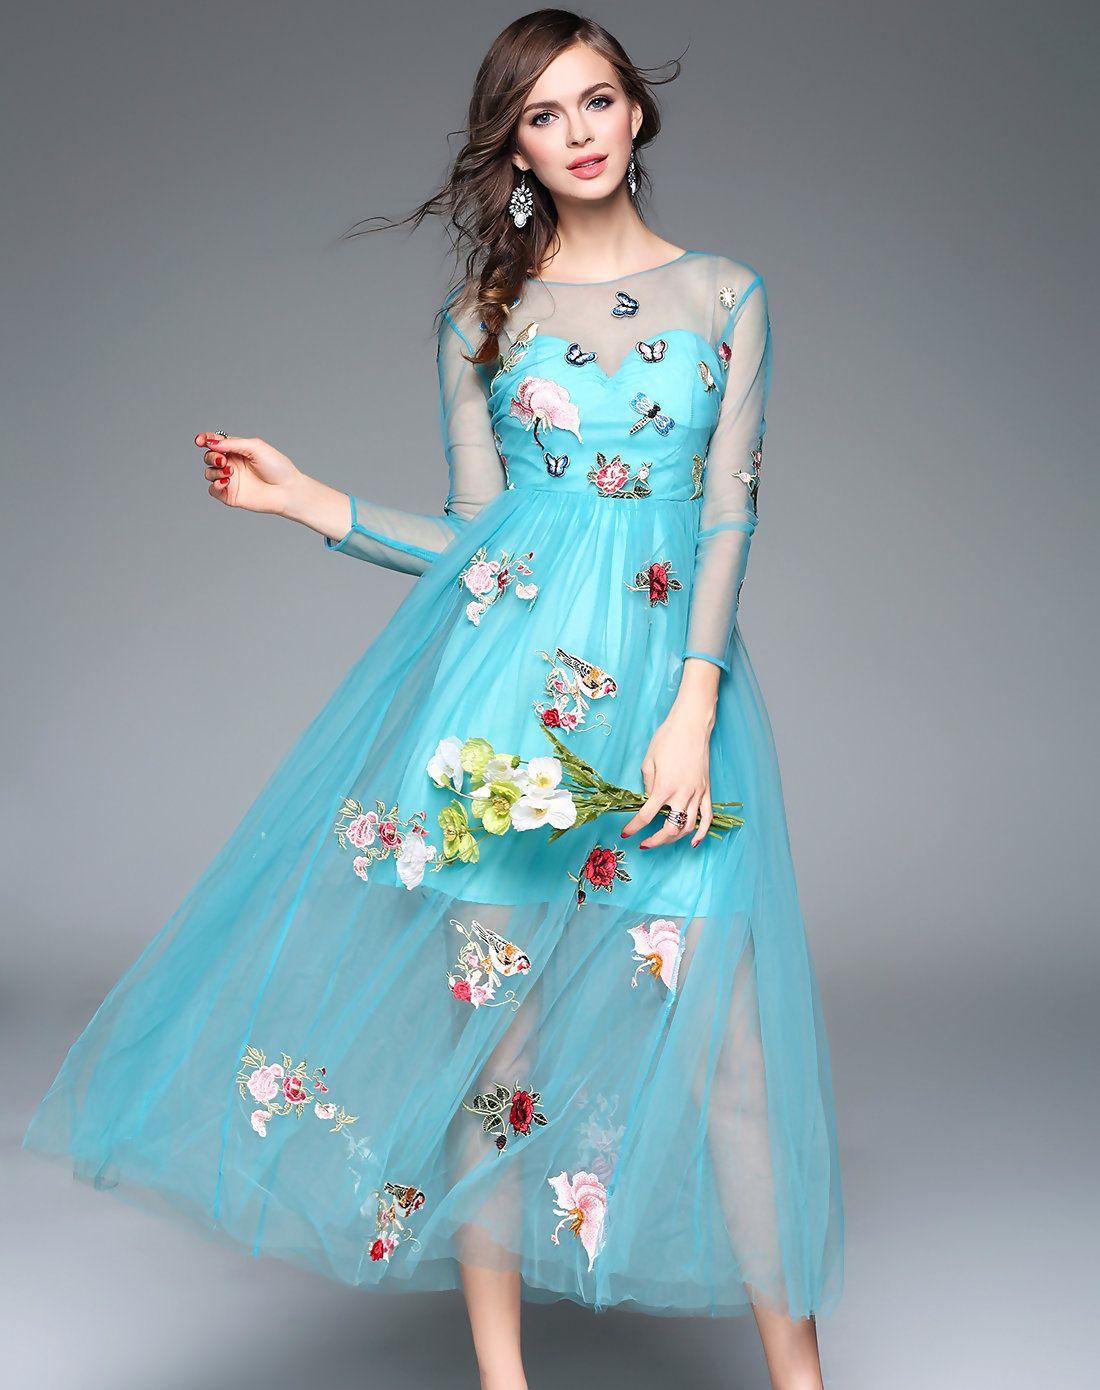 Blue Embroidery Elegant Party Maxi Dress   Party maxi dresses, Maxi ...